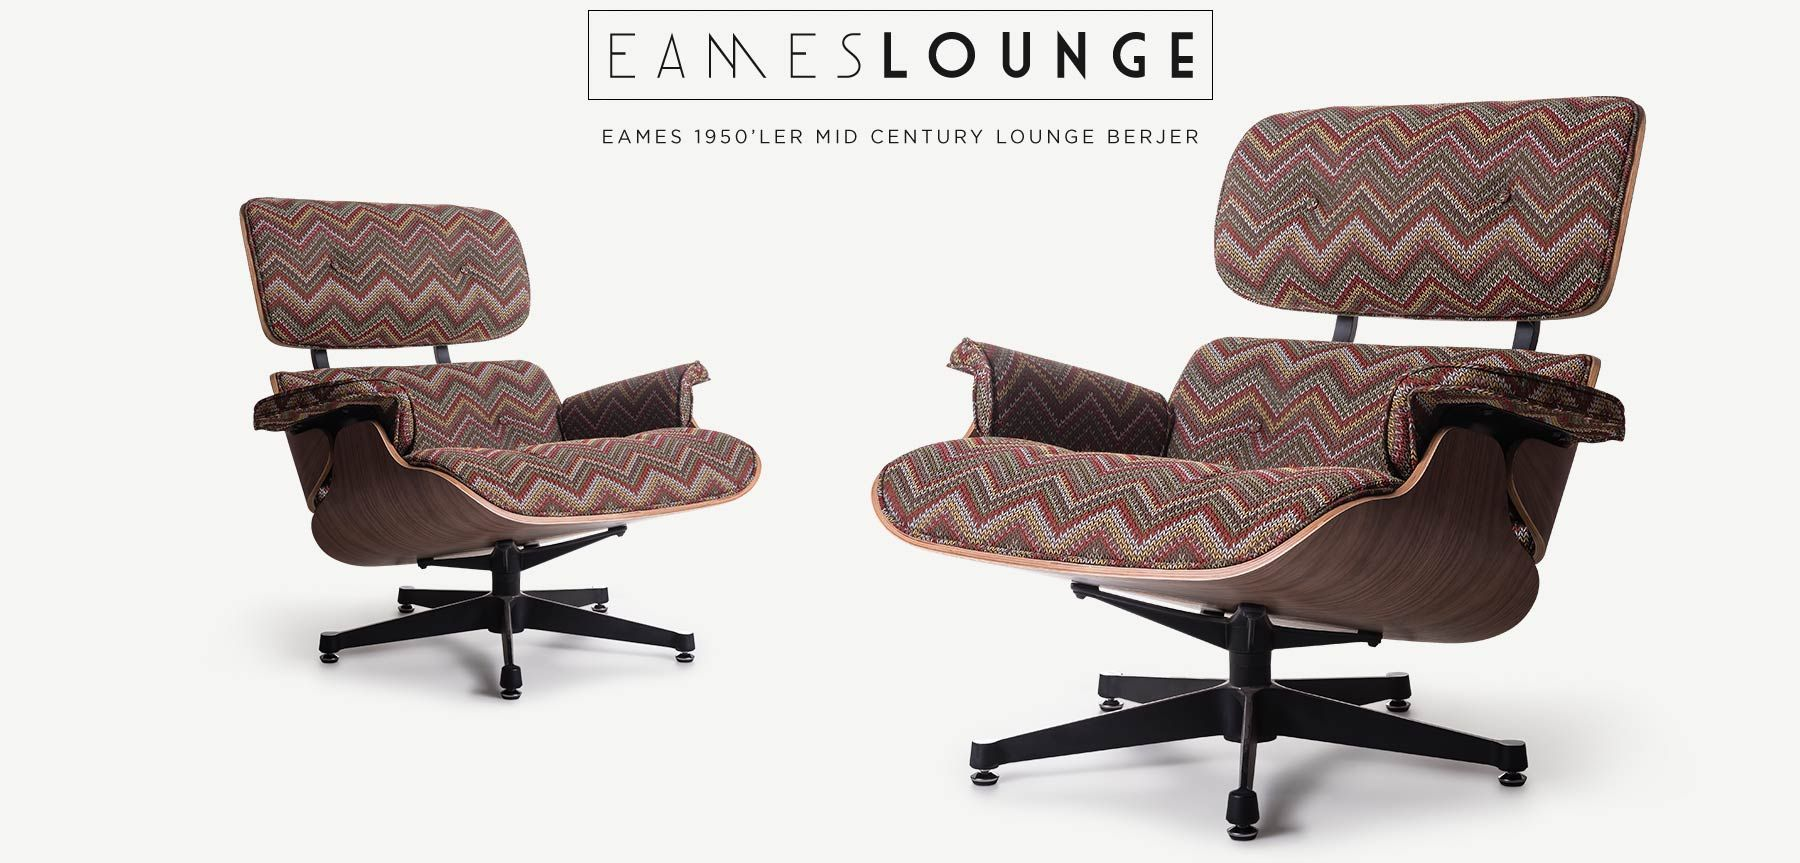 Ray Charles Eames Lounge Chair 1956 Yili Ray Charles Eames Tasarimi Missoni Koltuk Ray Charles Eames Lounge Chair Eames Lounges Furniture